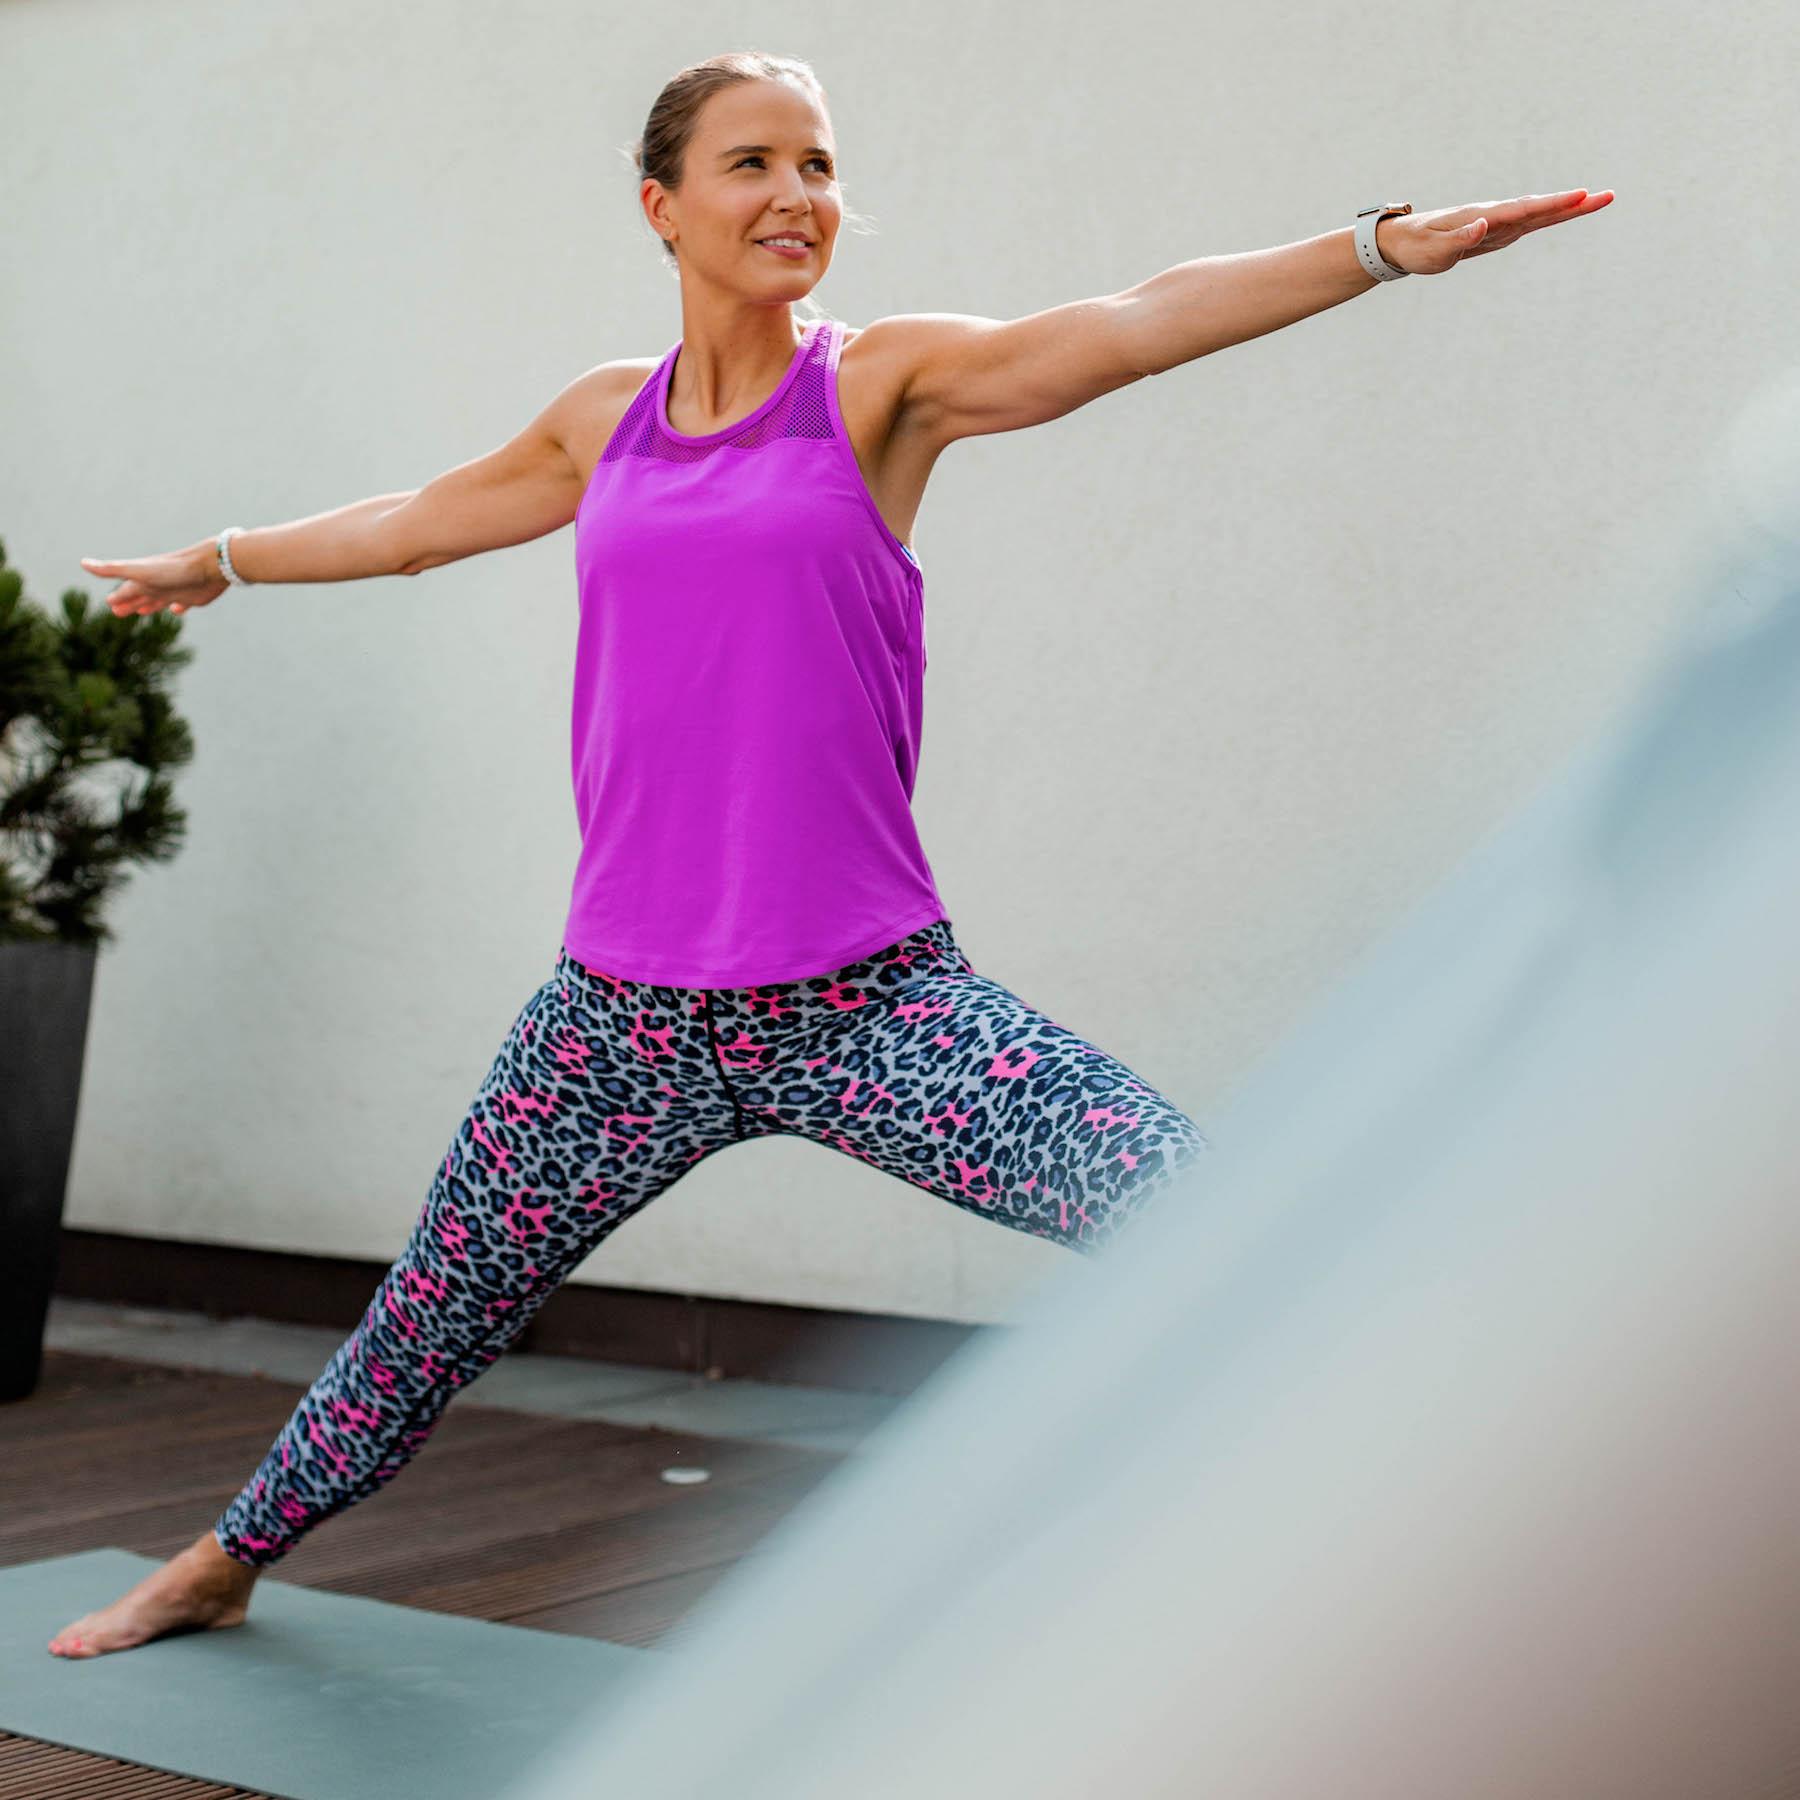 routine motivation susan fengler suelovesnyc_susan_fengler_routine_motivation_yoga_hamburg